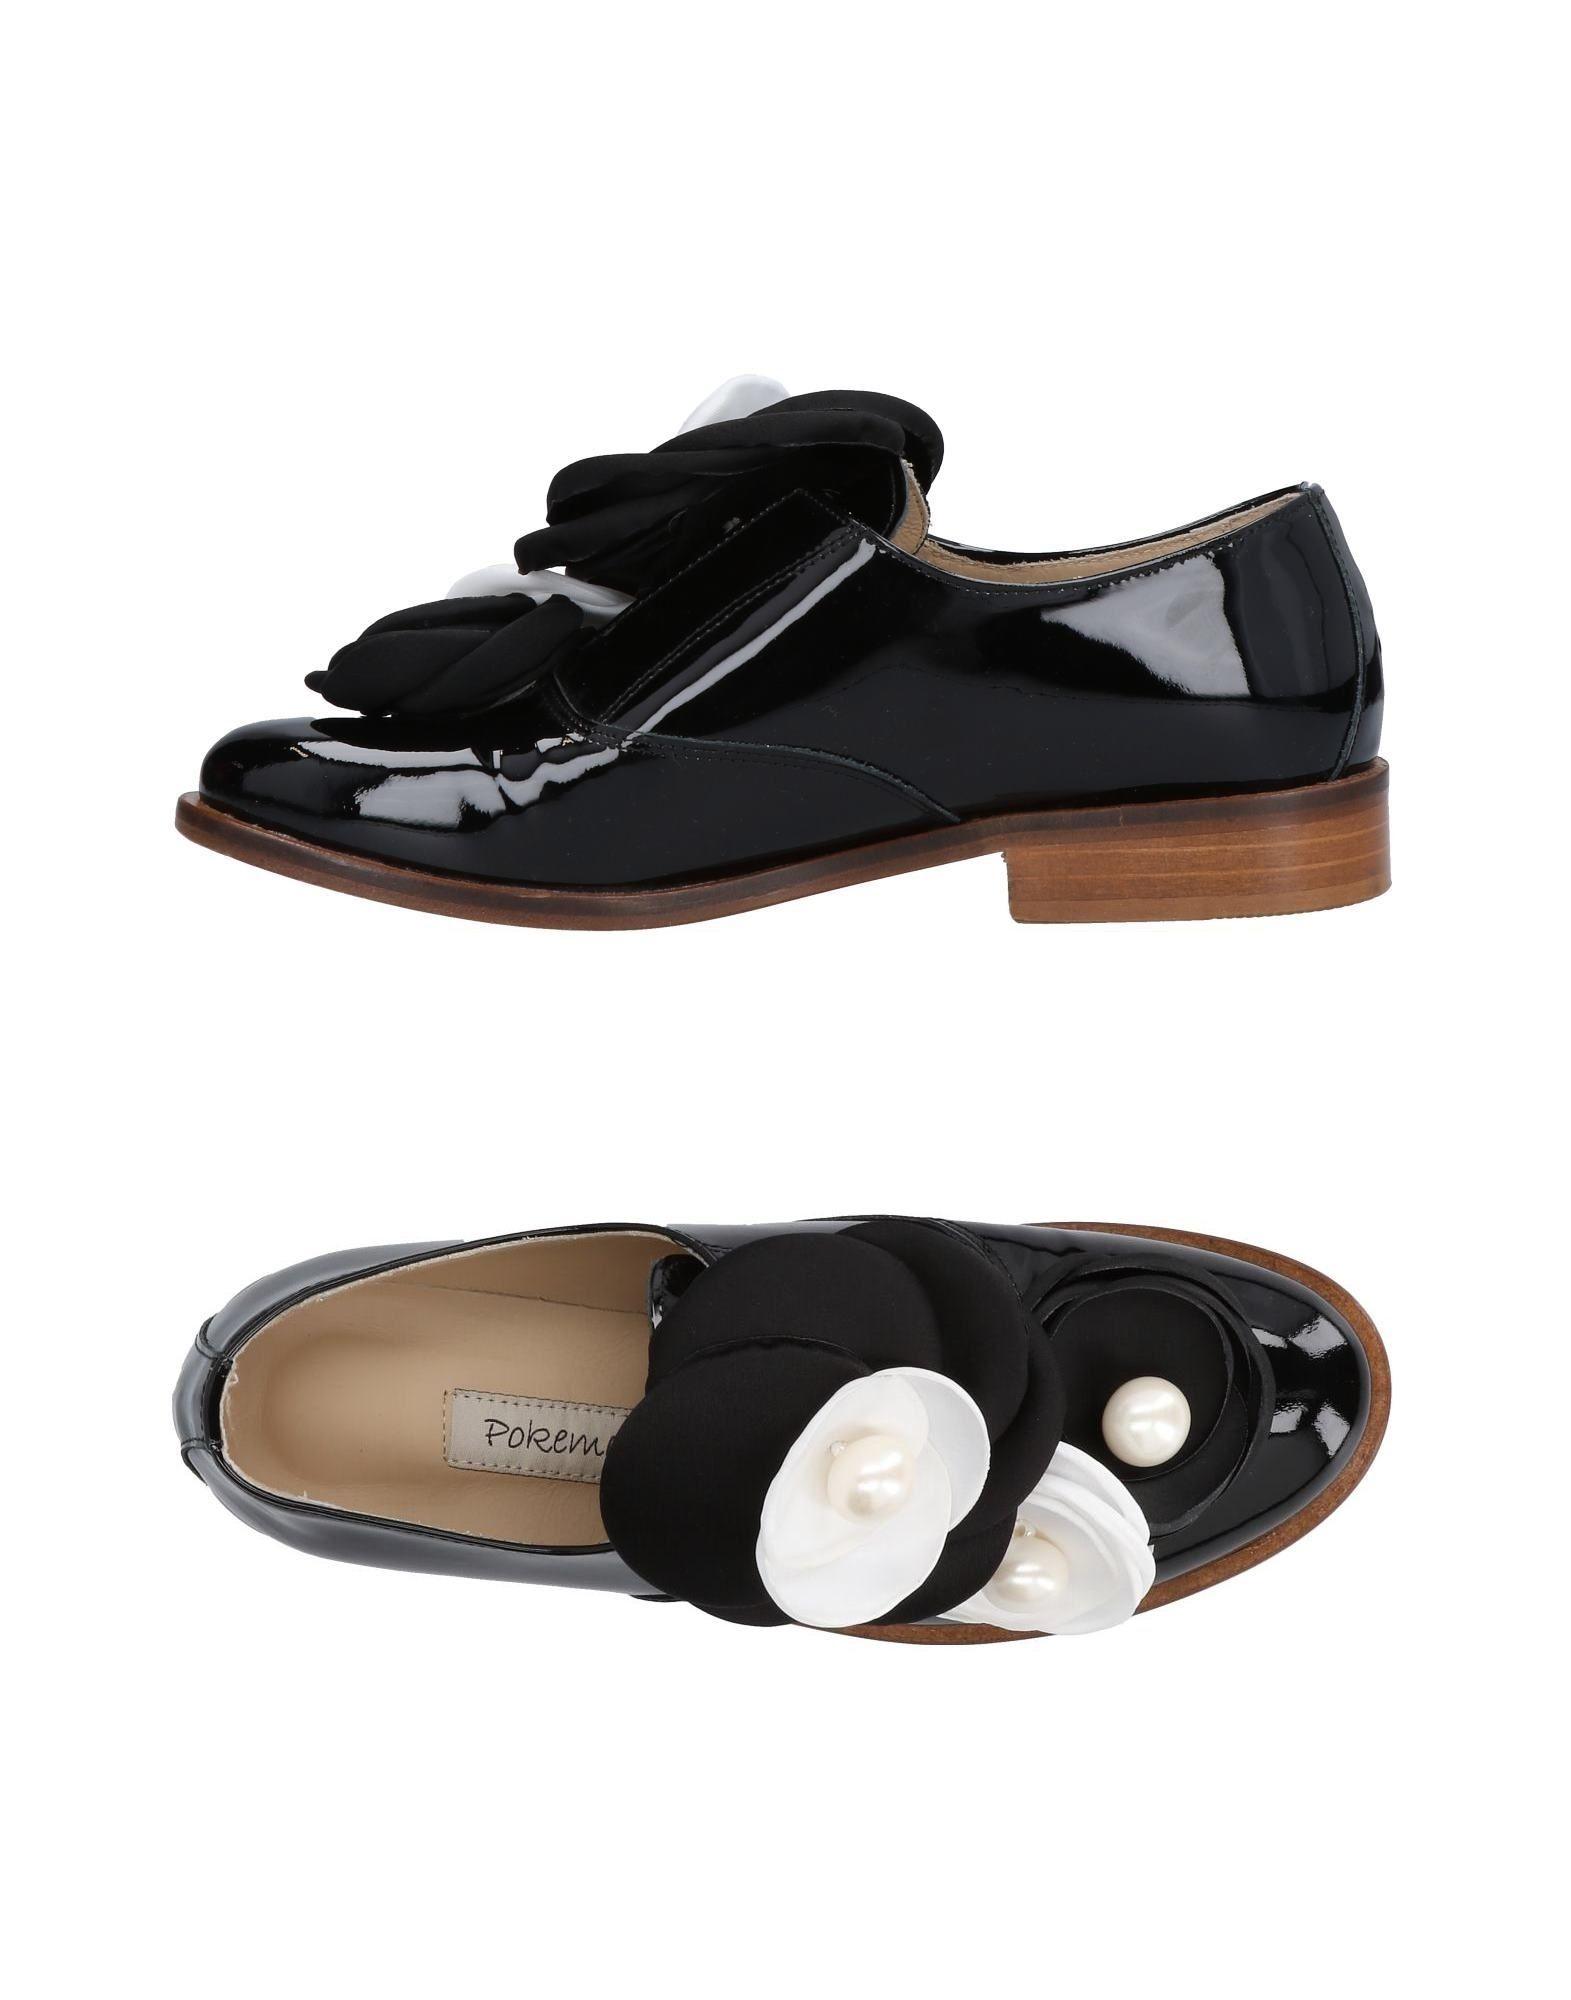 Pokemaoke Mokassins Damen  11473659ILGut aussehende strapazierfähige Schuhe